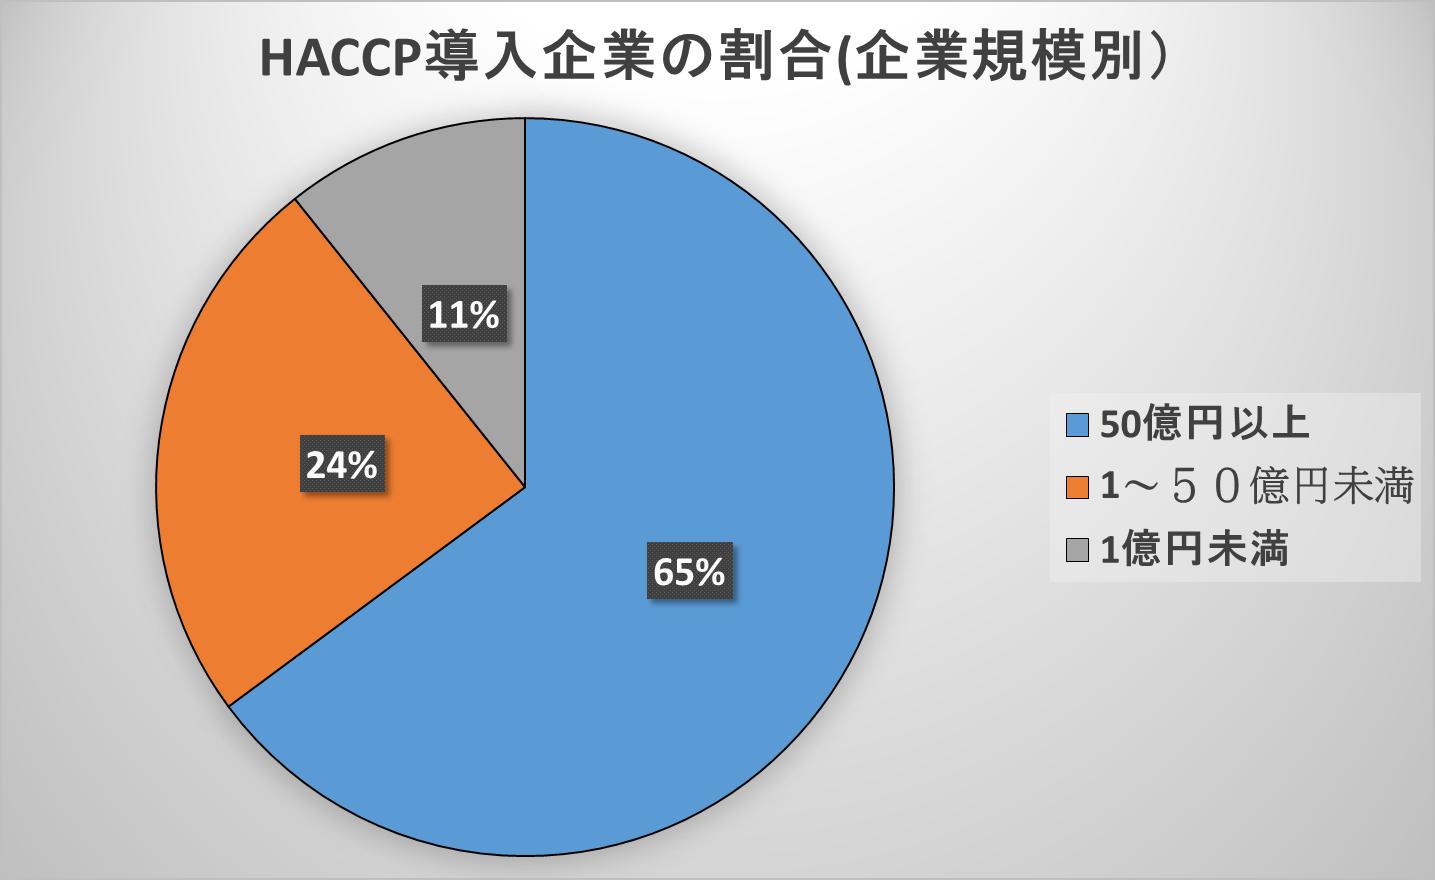 HACCP導入企業割合